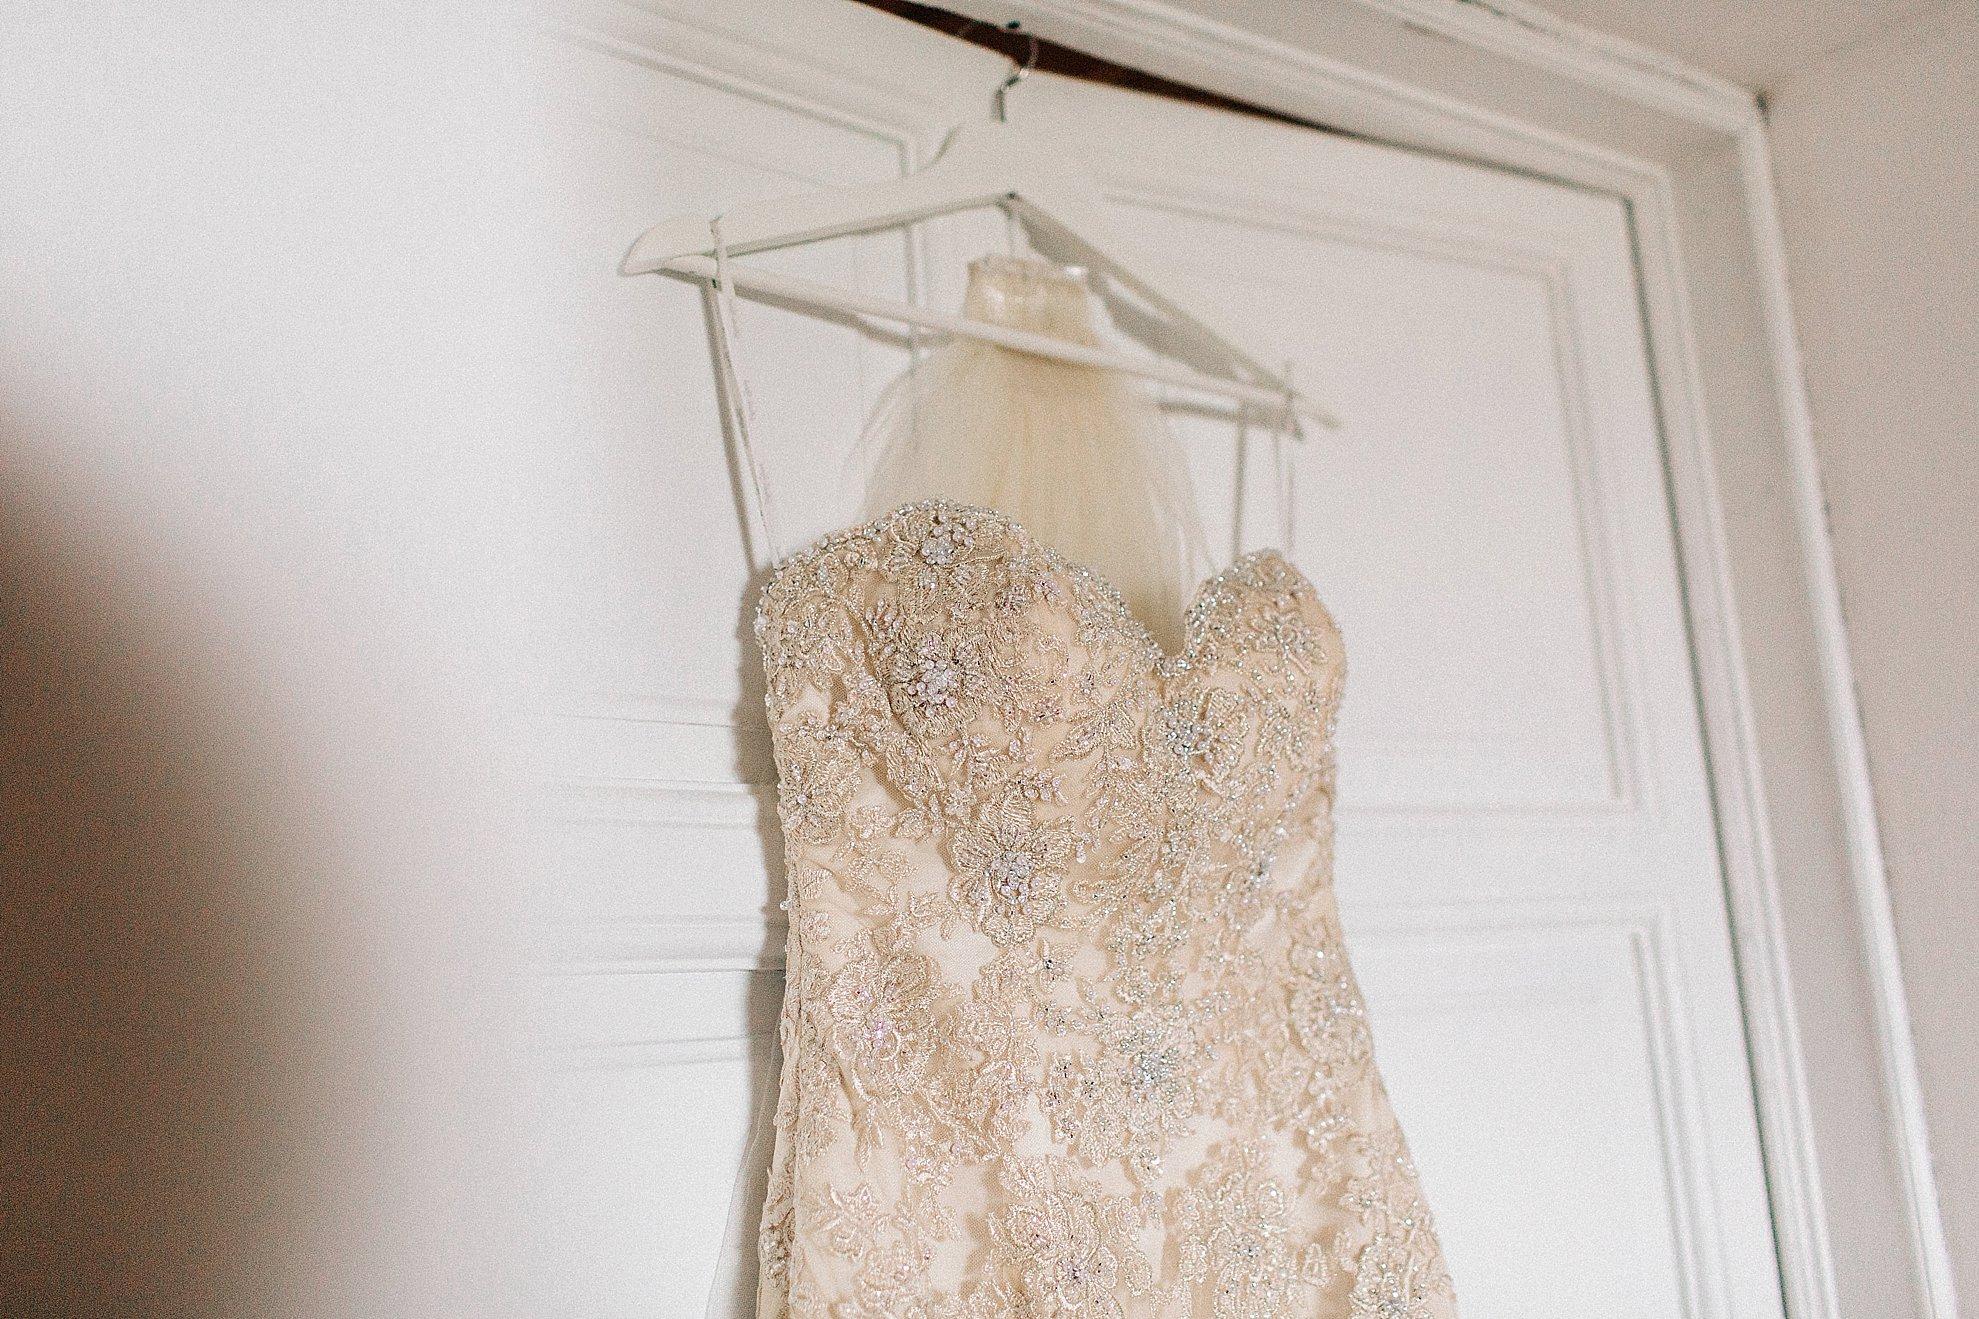 Amanda-Drost-photography-bruiloft-italie-wedding-italy-_0004.jpg